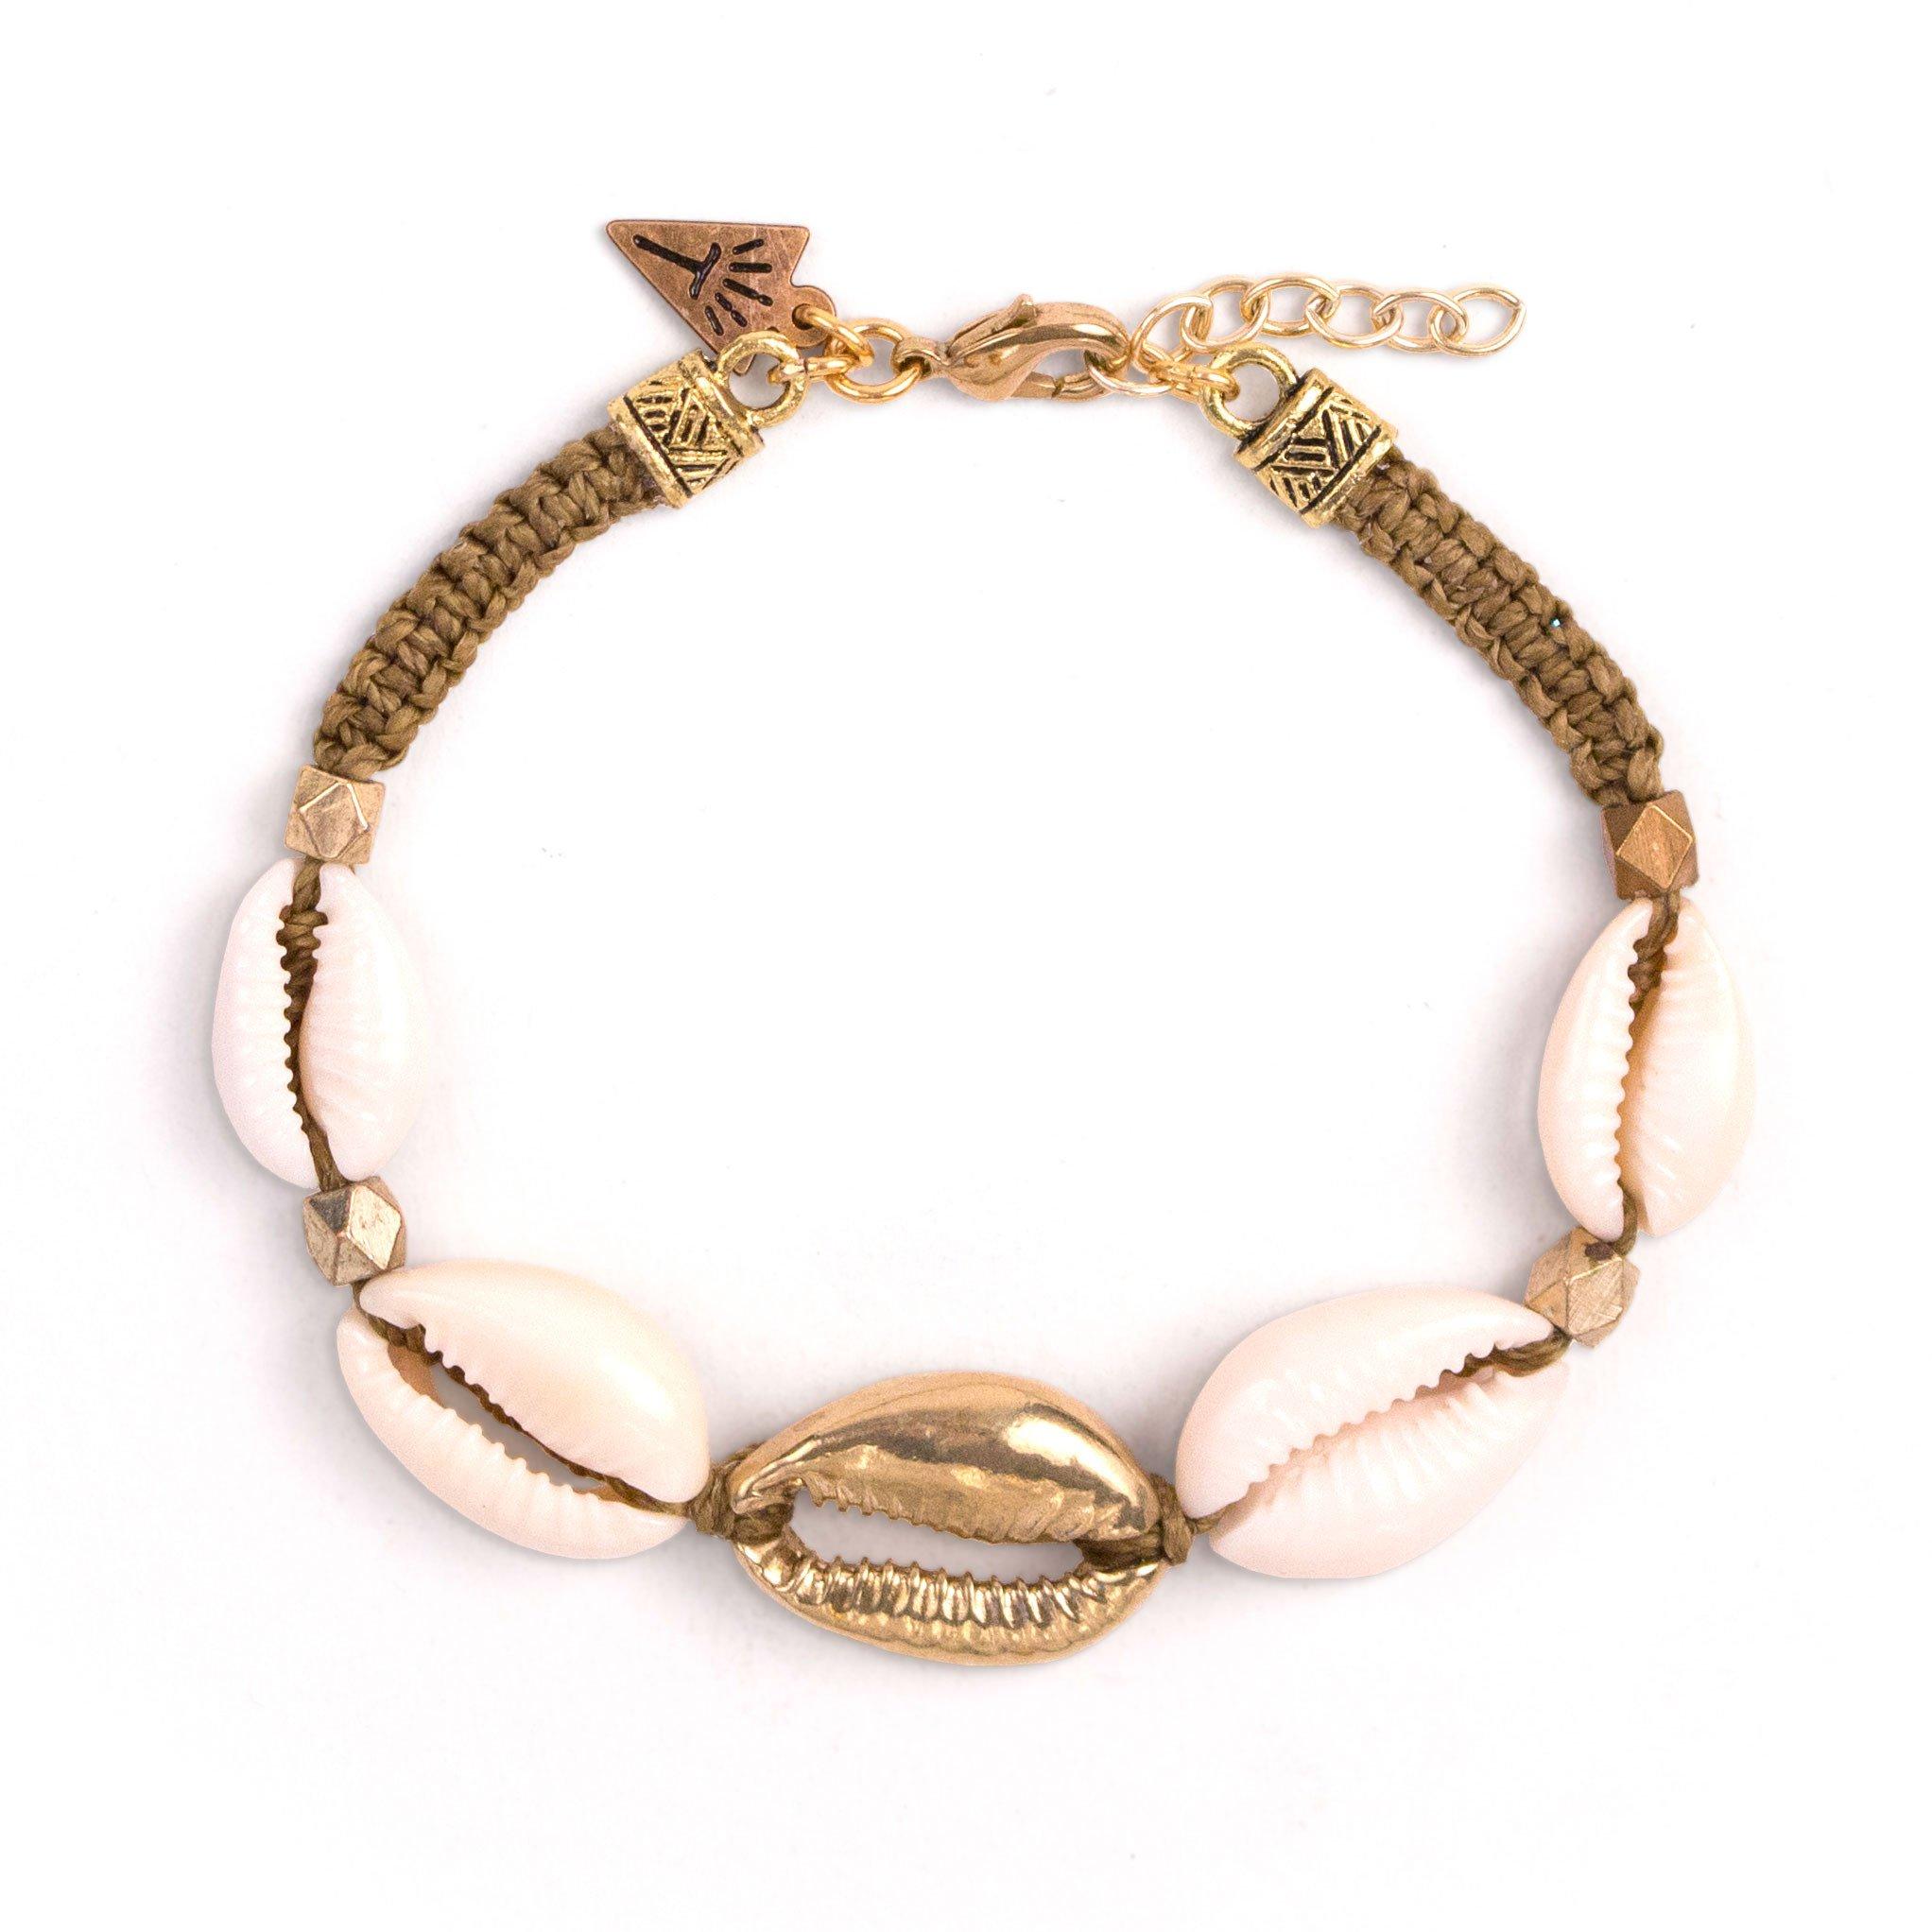 Charm Bracelet - STONEHENGE II by VIDA VIDA y1qEvCu3L